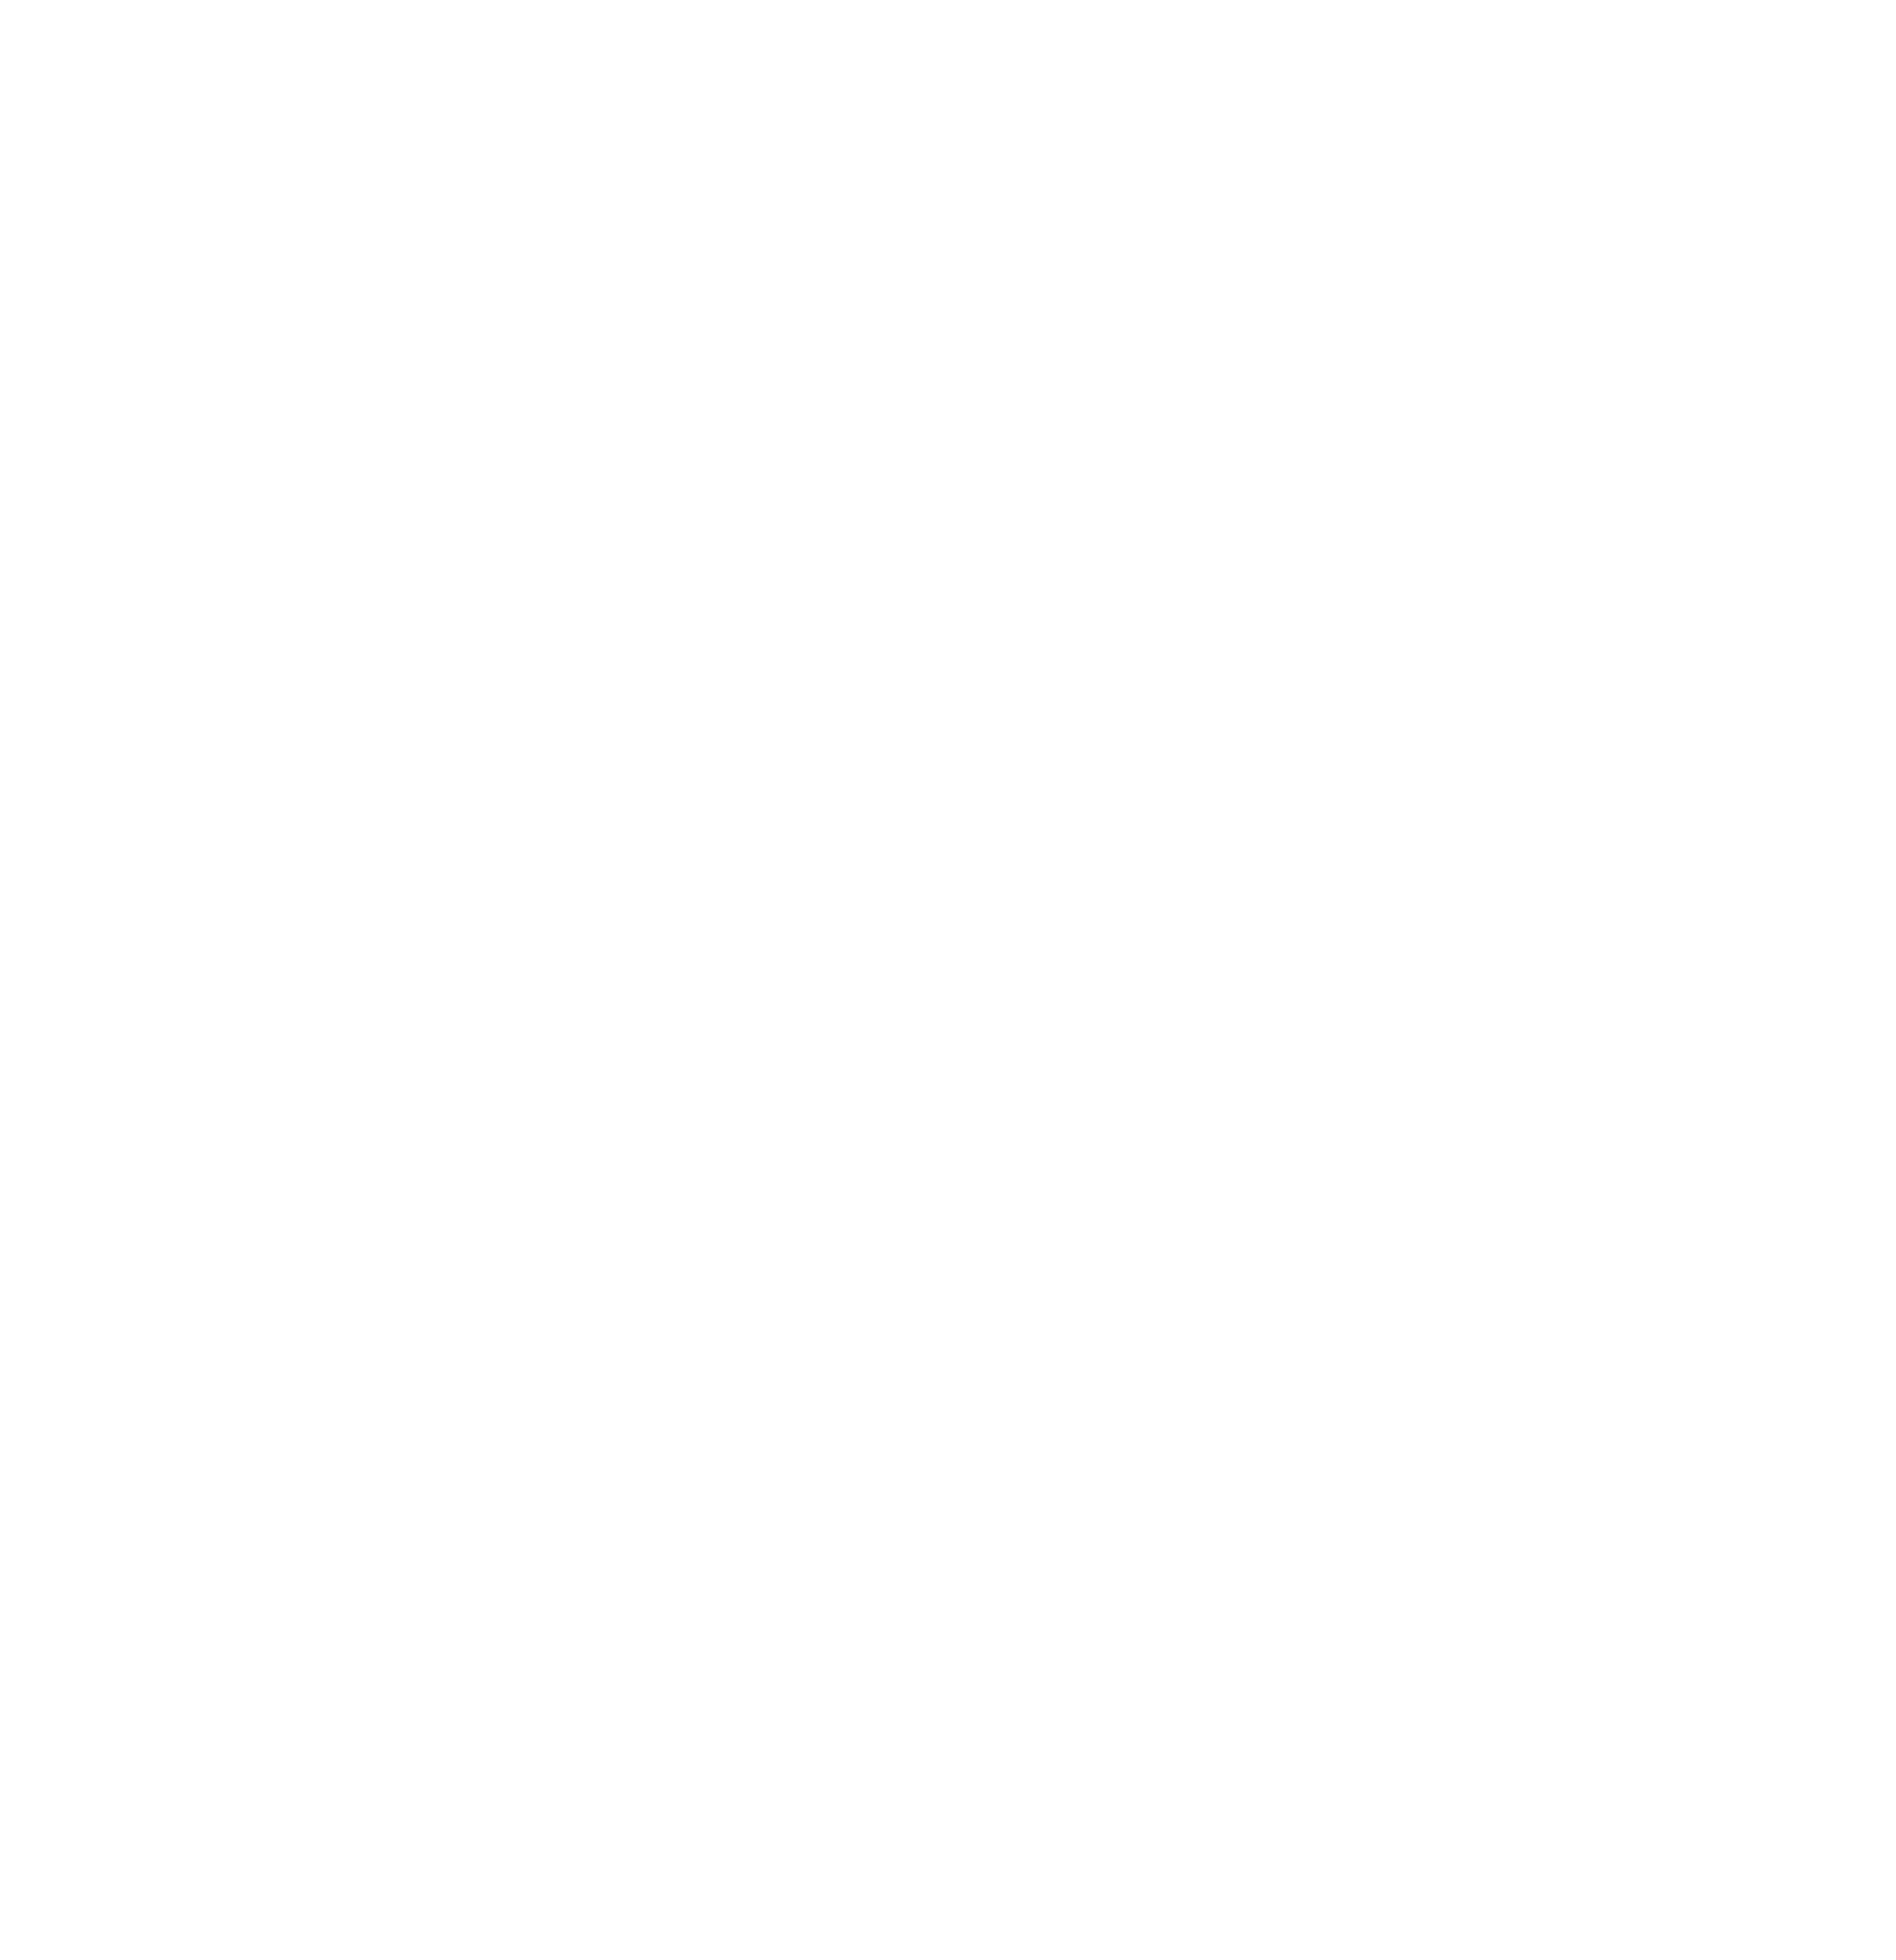 UP21_Hexagon[White]-1